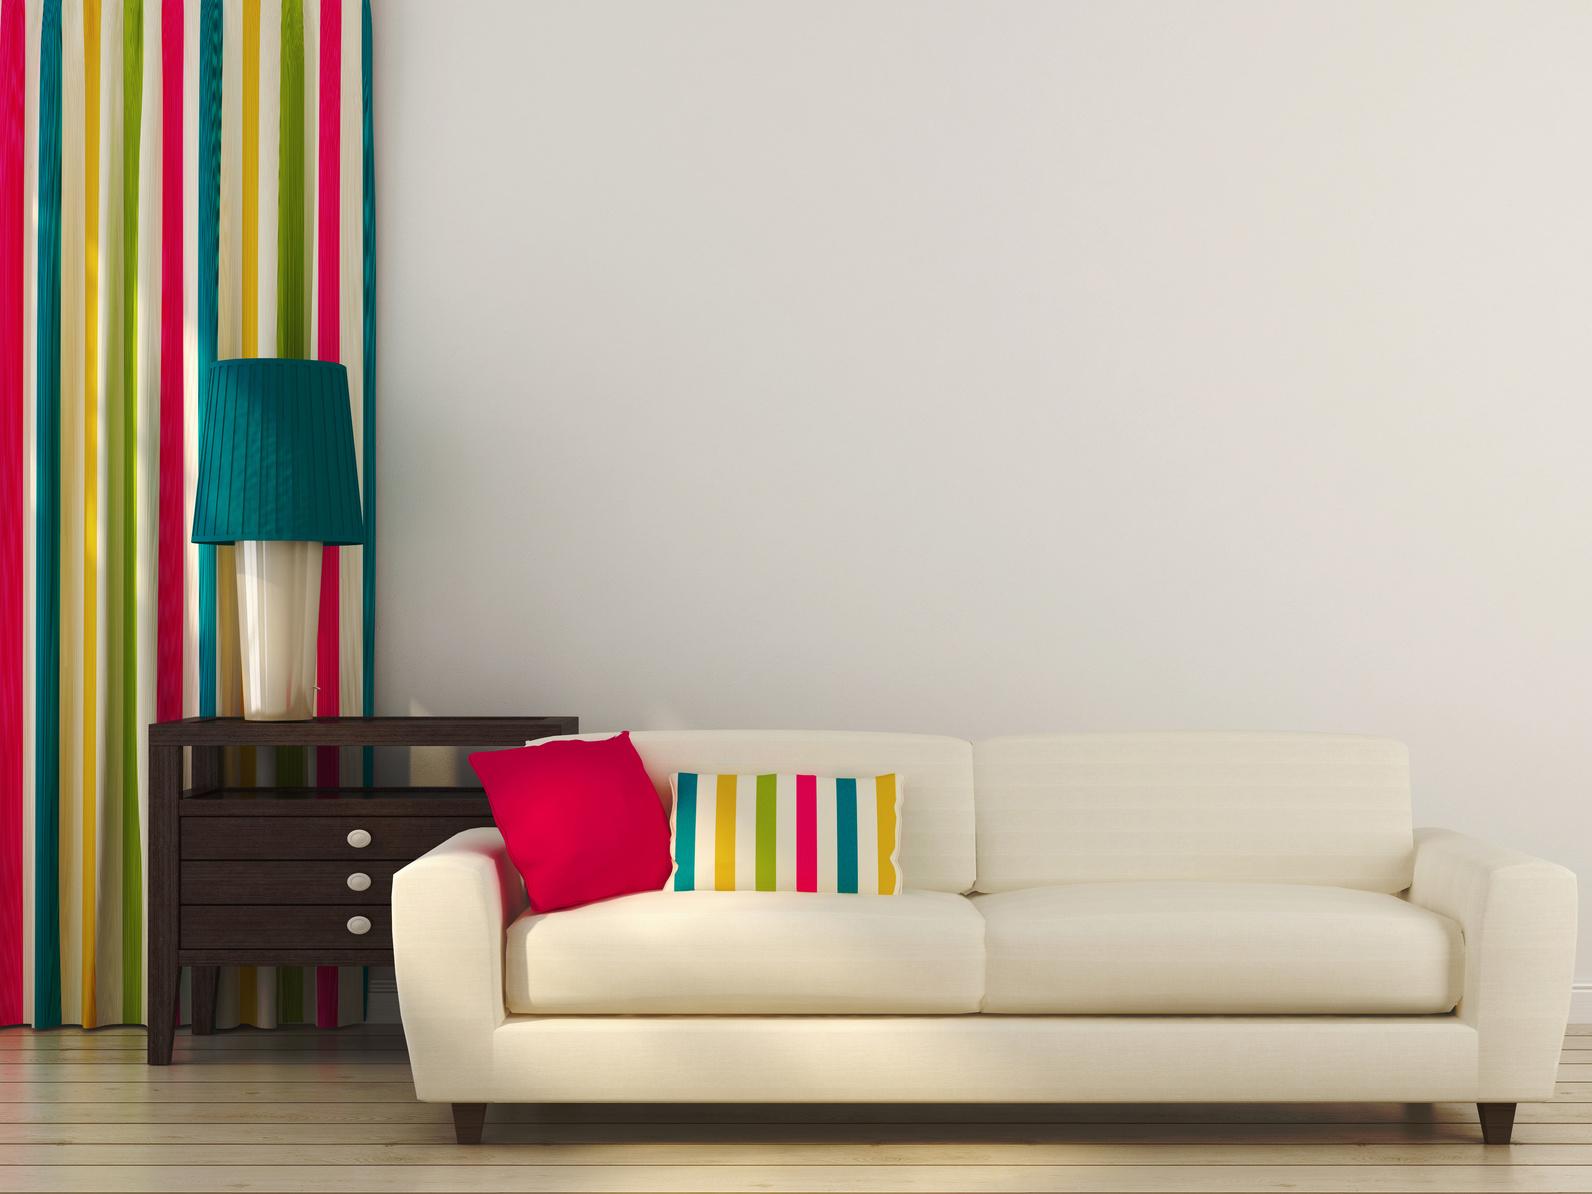 White sofa with colorful decor